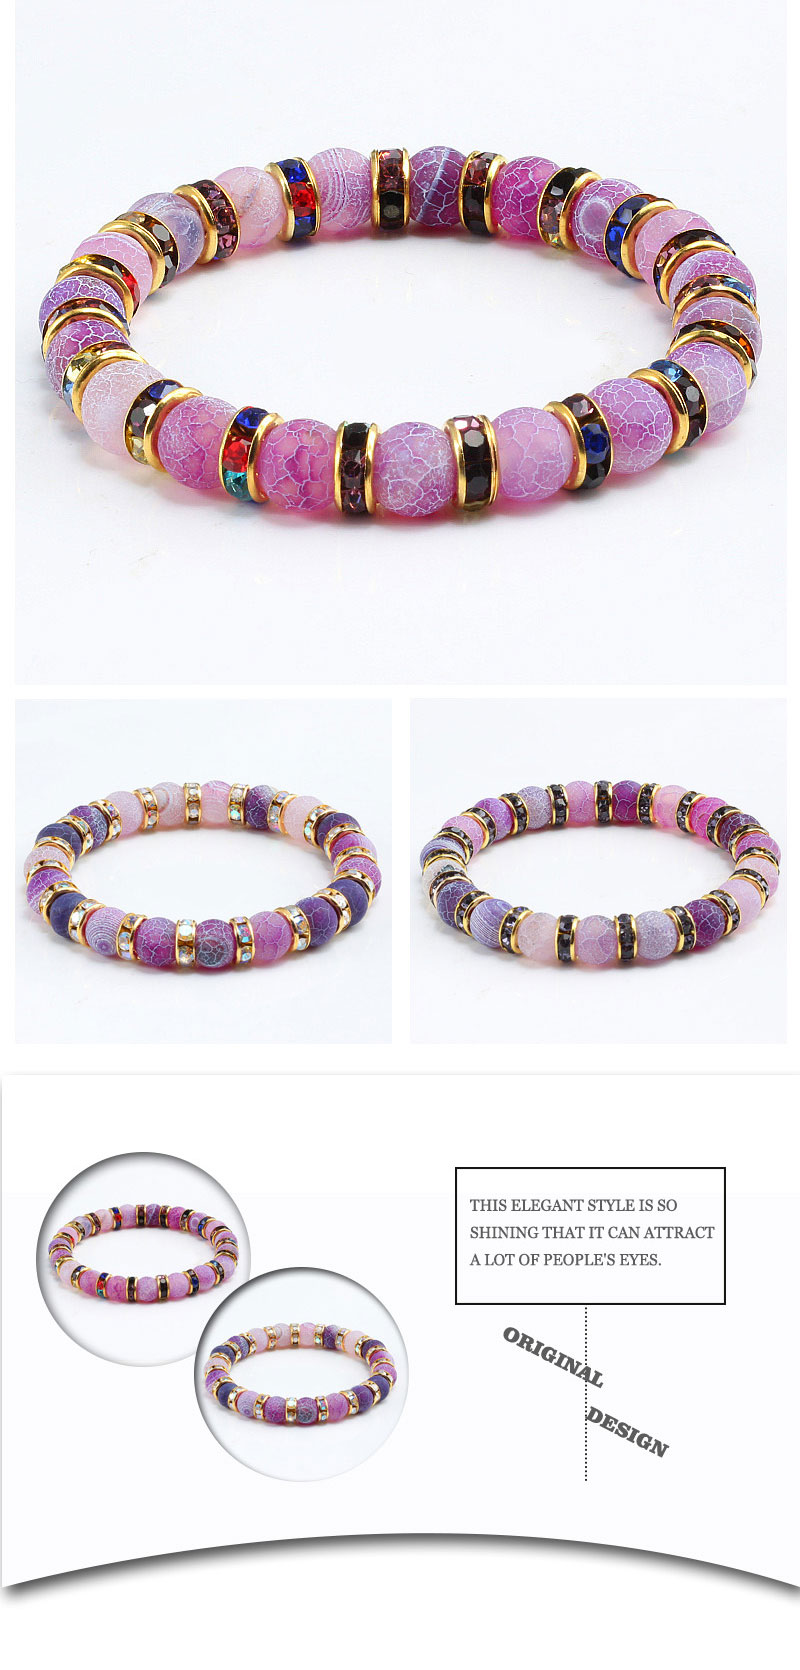 1Pcs Classic Colorful Purple Love Crystal Beaded Chakra Yoga Bracelet Female Natural Stone Beads Bracelets Women Men Jewelry Hot 4